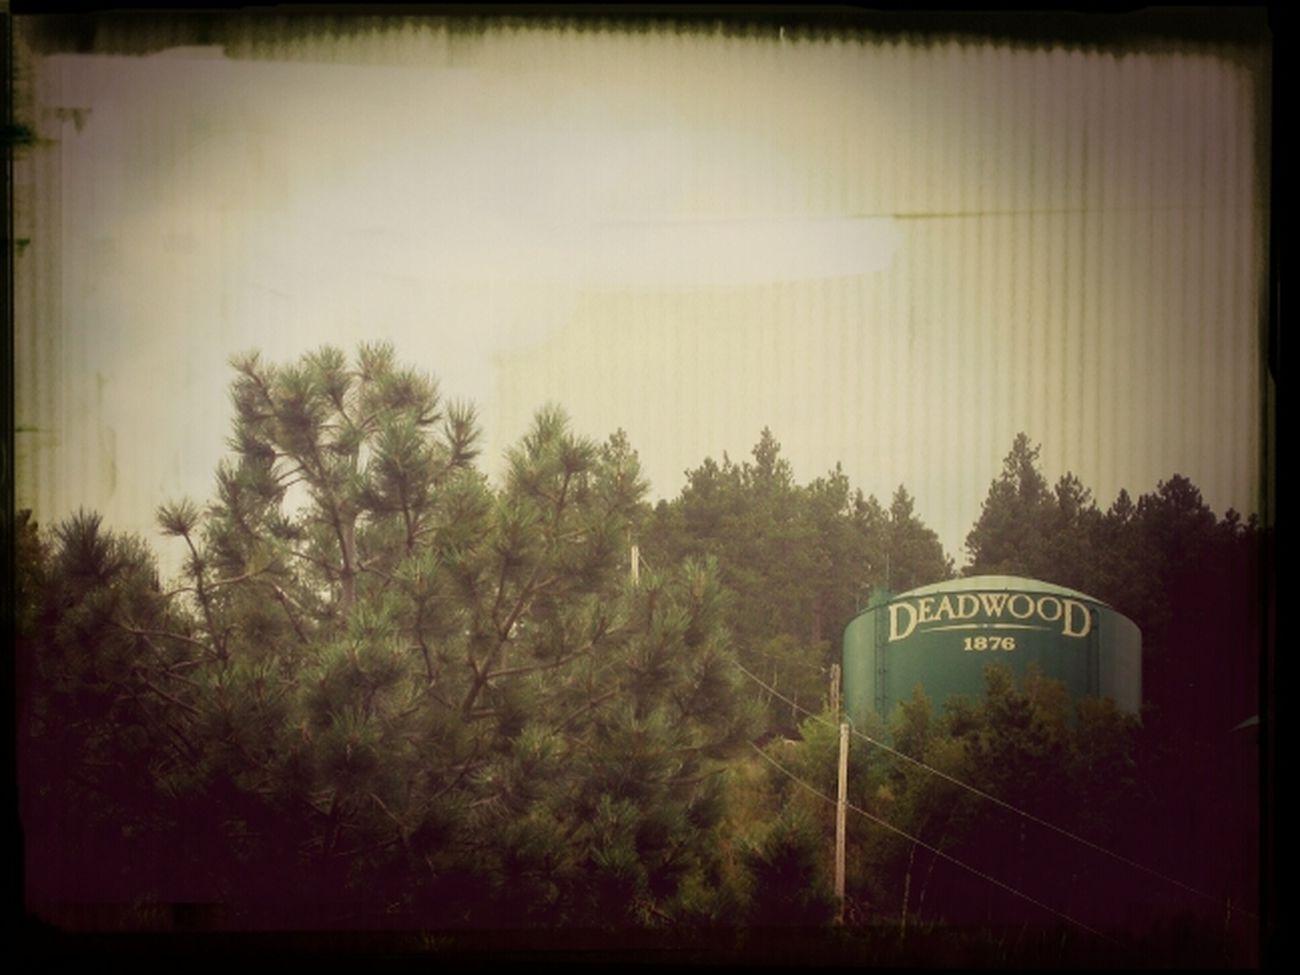 Scenic Deadwood